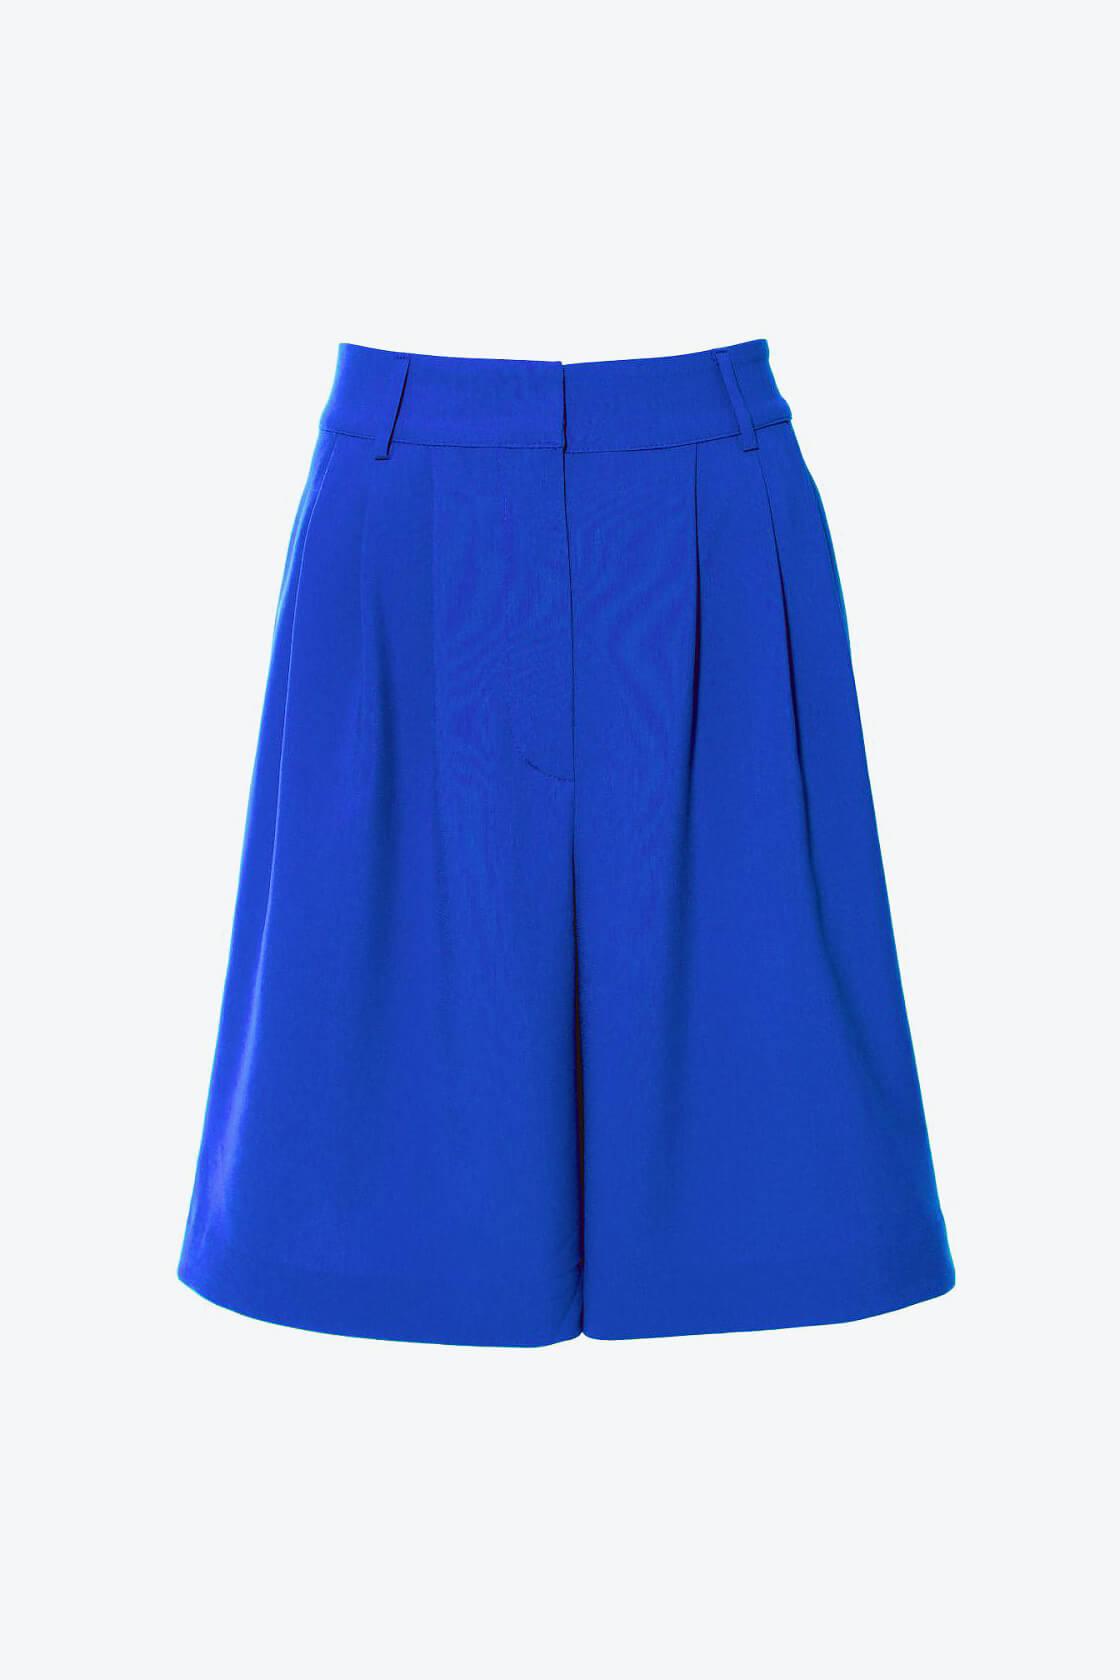 OL100002572 Shorts Billie Classic Blue1